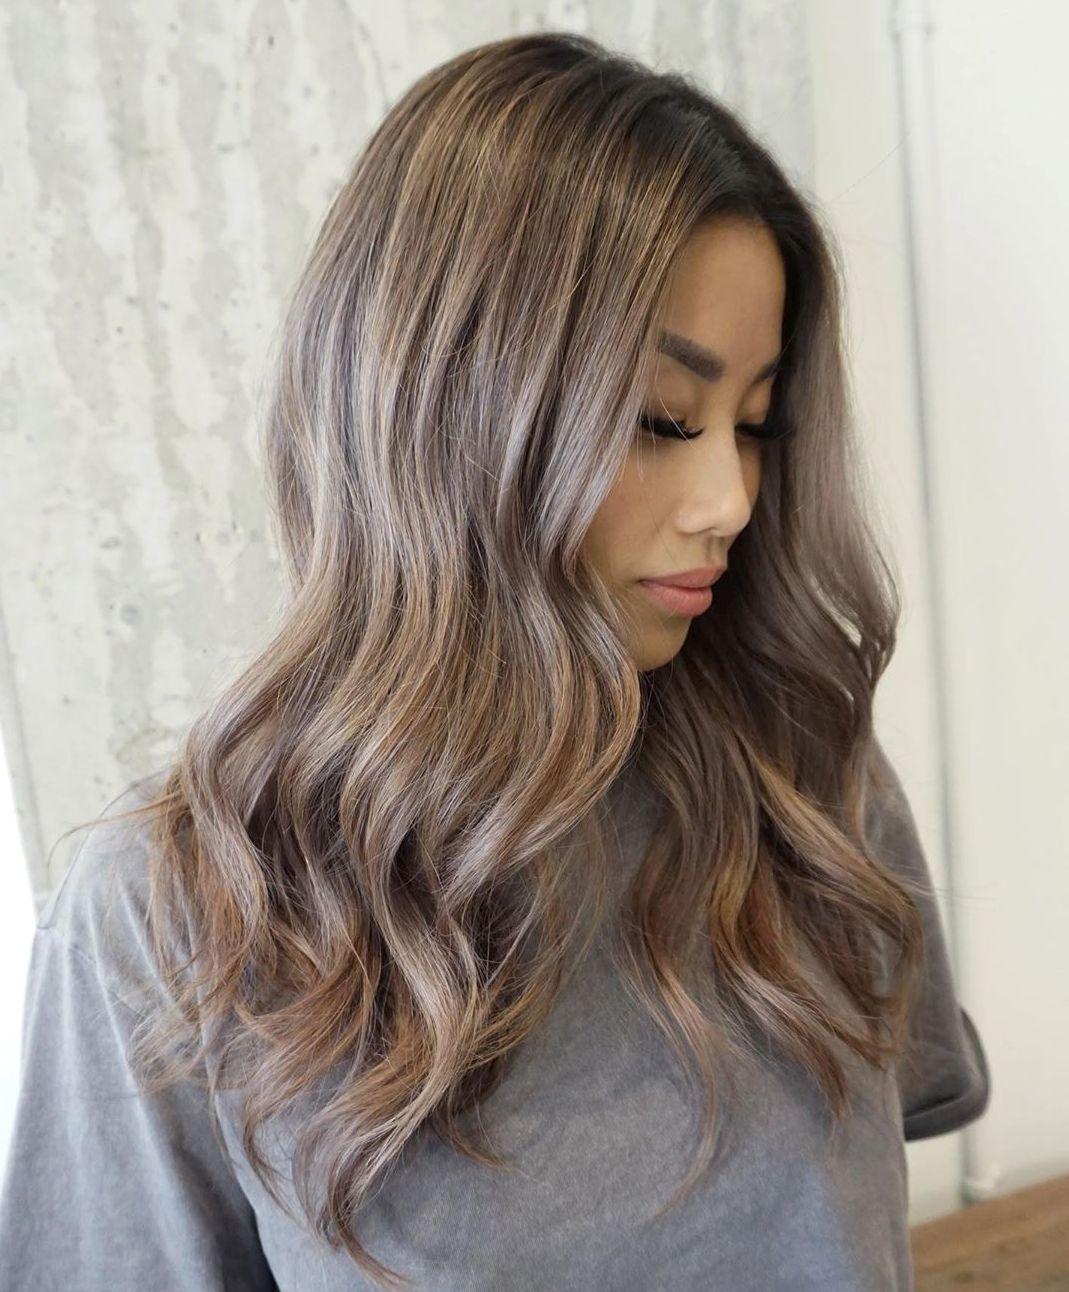 Dark Ash Blonde Hair with Strawberry Highlights